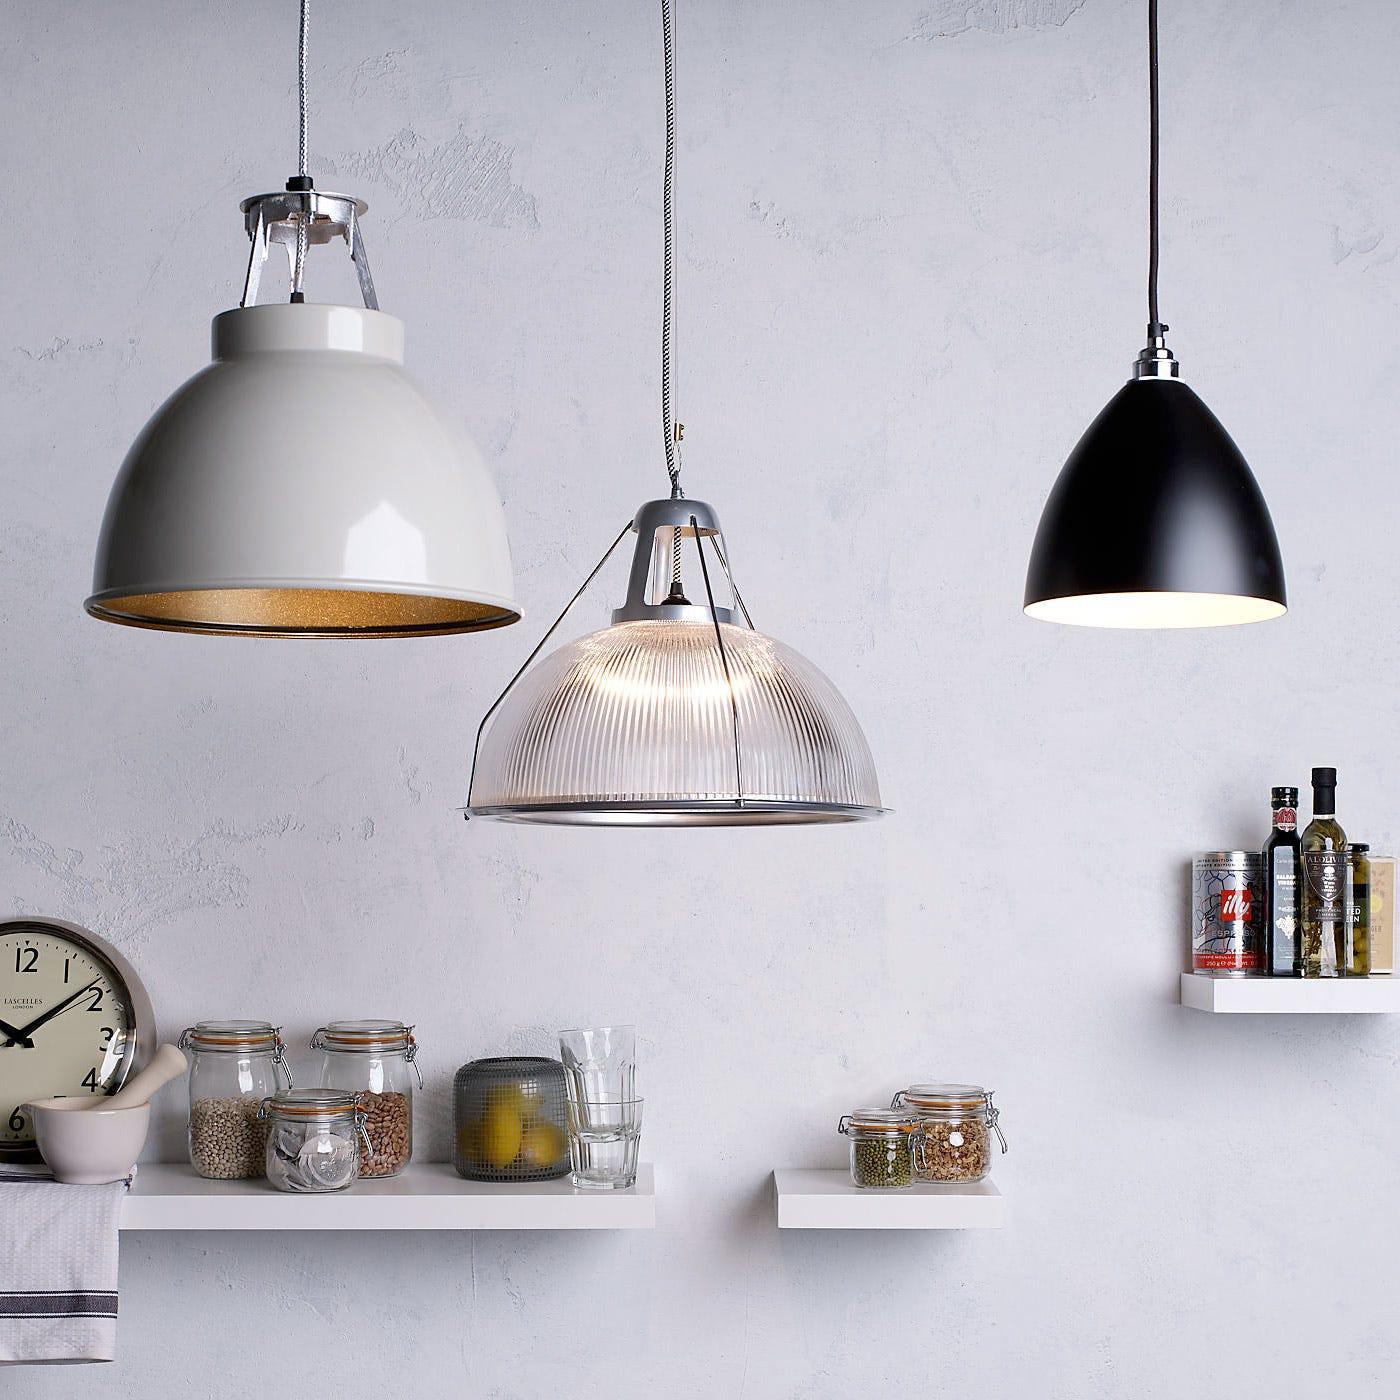 task pendant kitchen lighting lighting collections